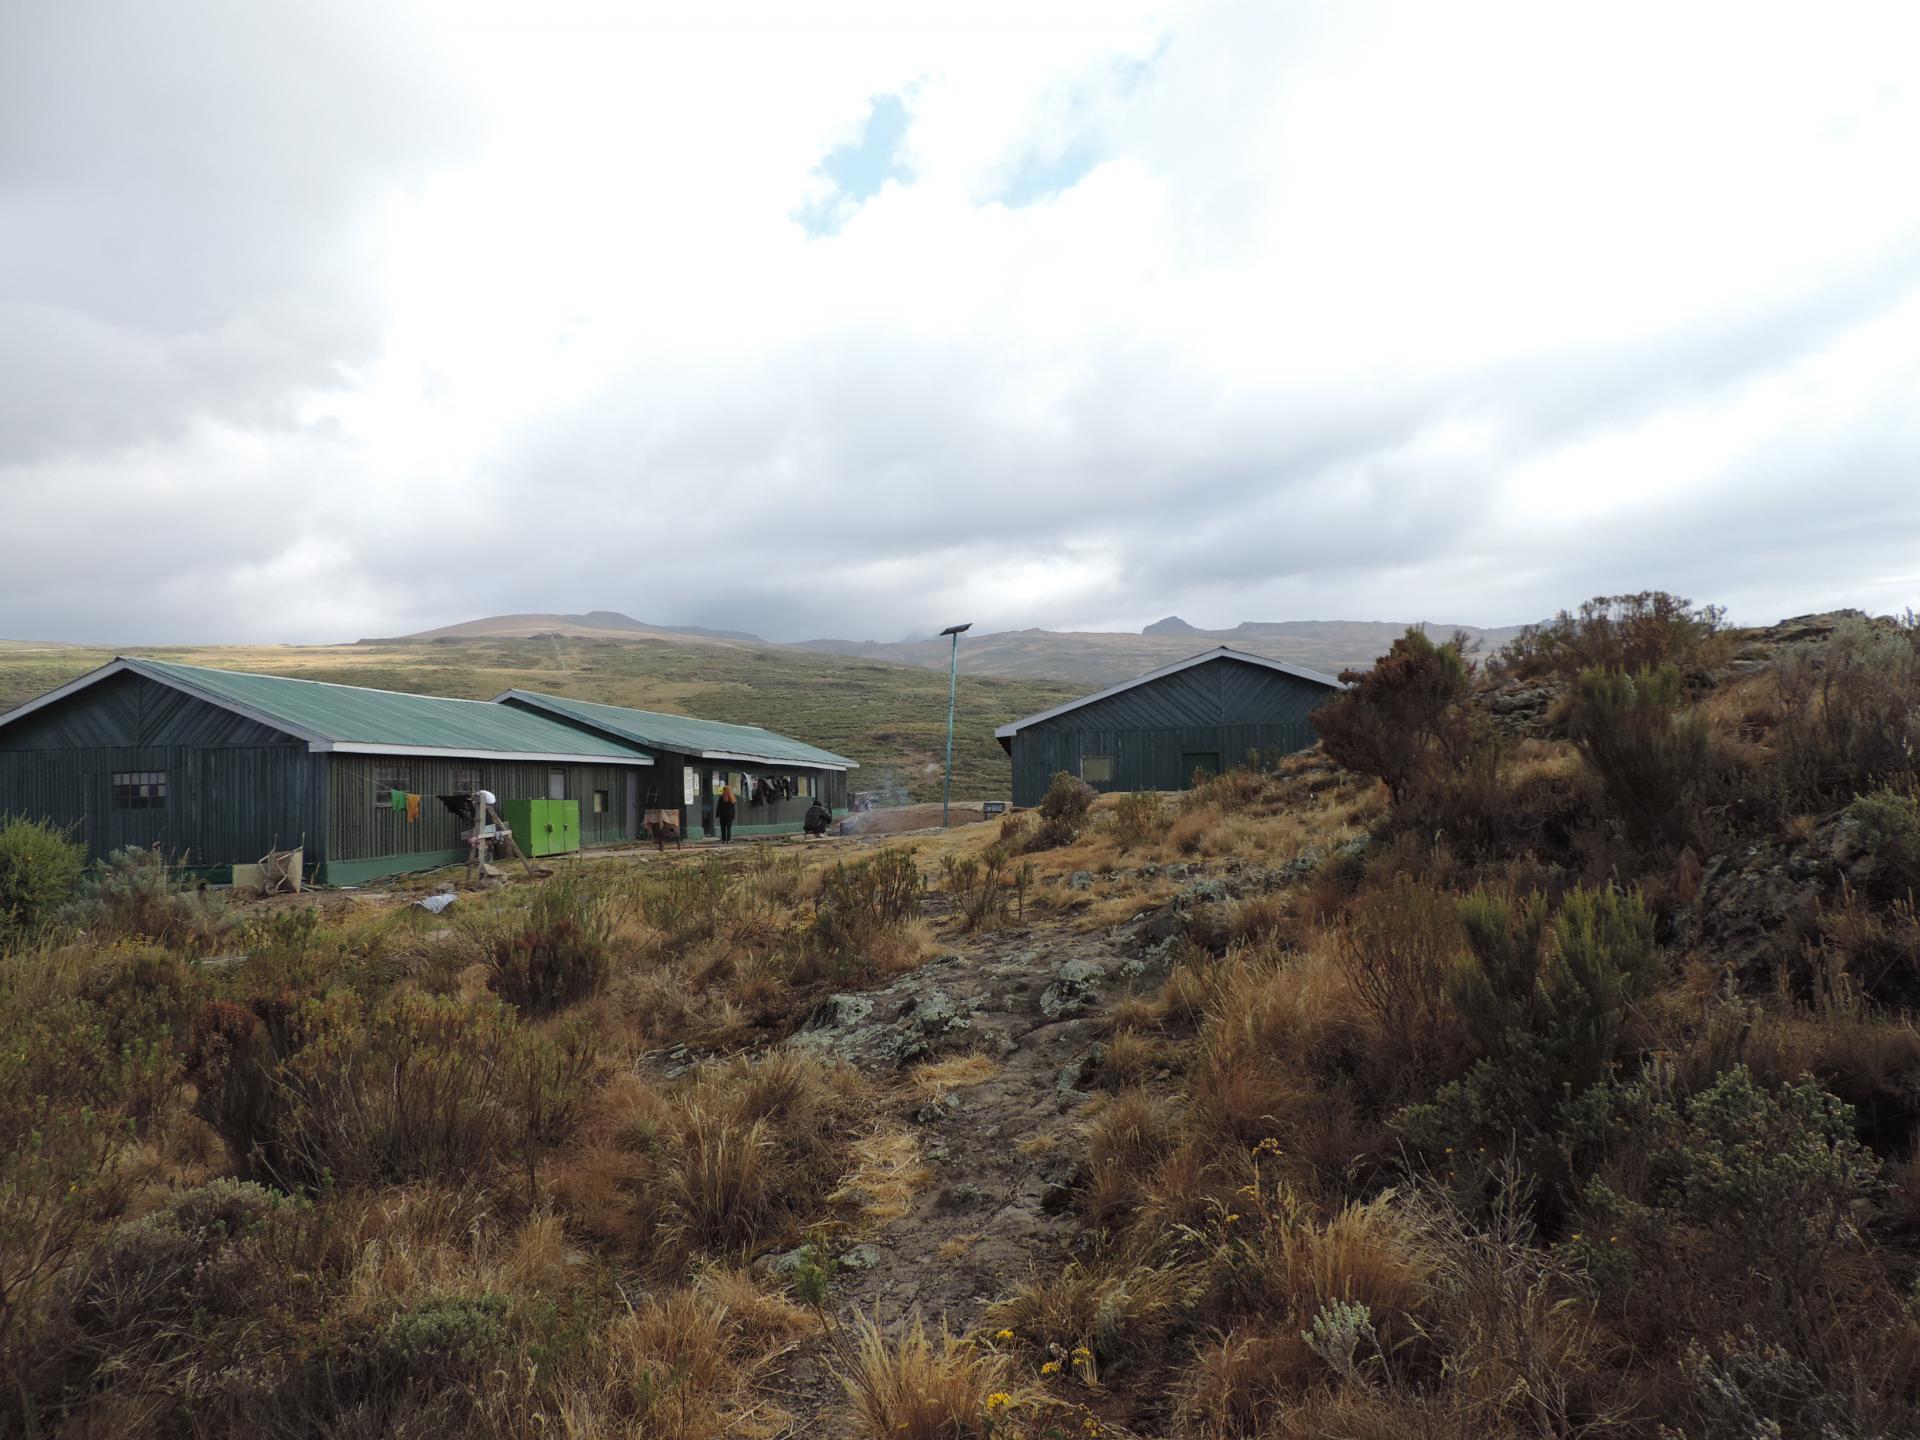 Chogoria Bandas, trekking trips Kenya, climbing mount Kenya, climbing Mount Kenya in Kenya, mount Kenya hiking, walking, route, trekking routes, yha Kenya travel, photos